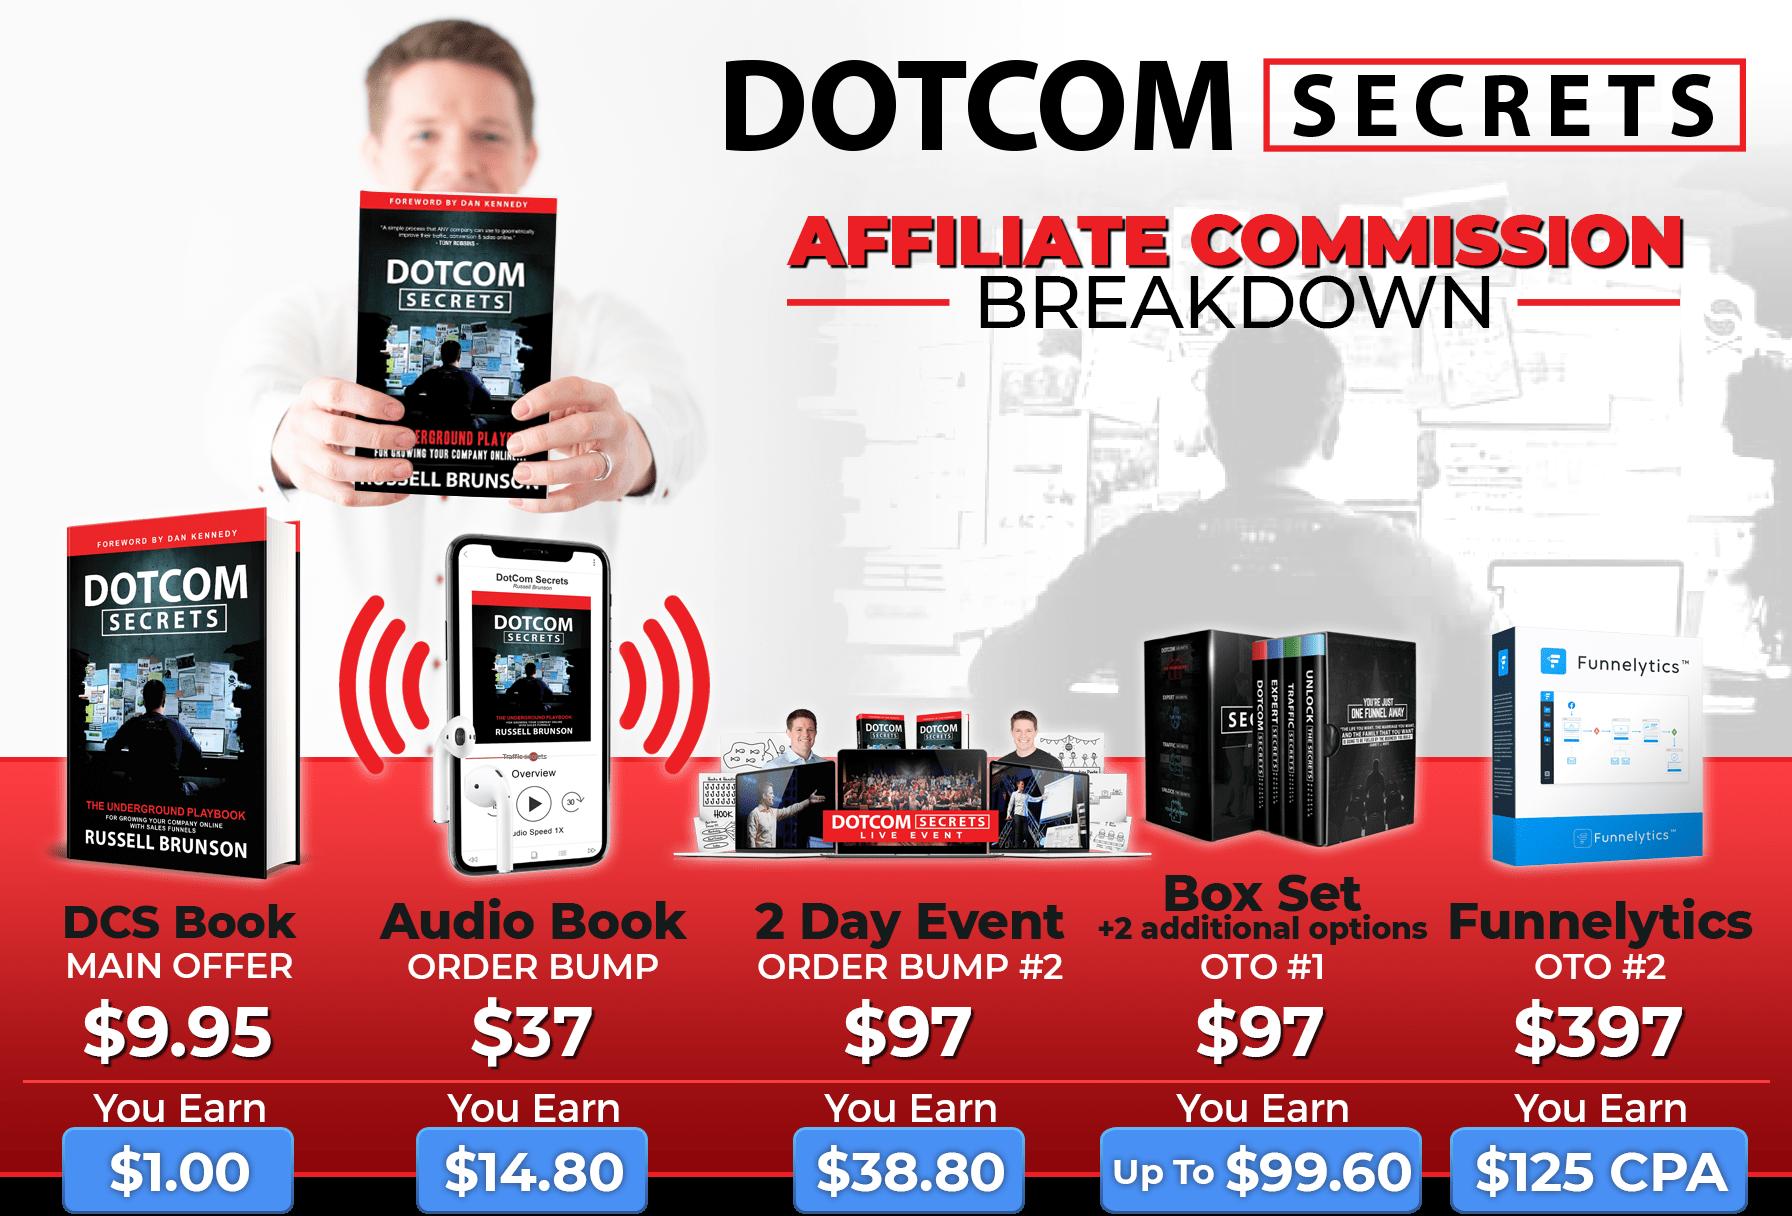 Dotcom Secrets Bonus